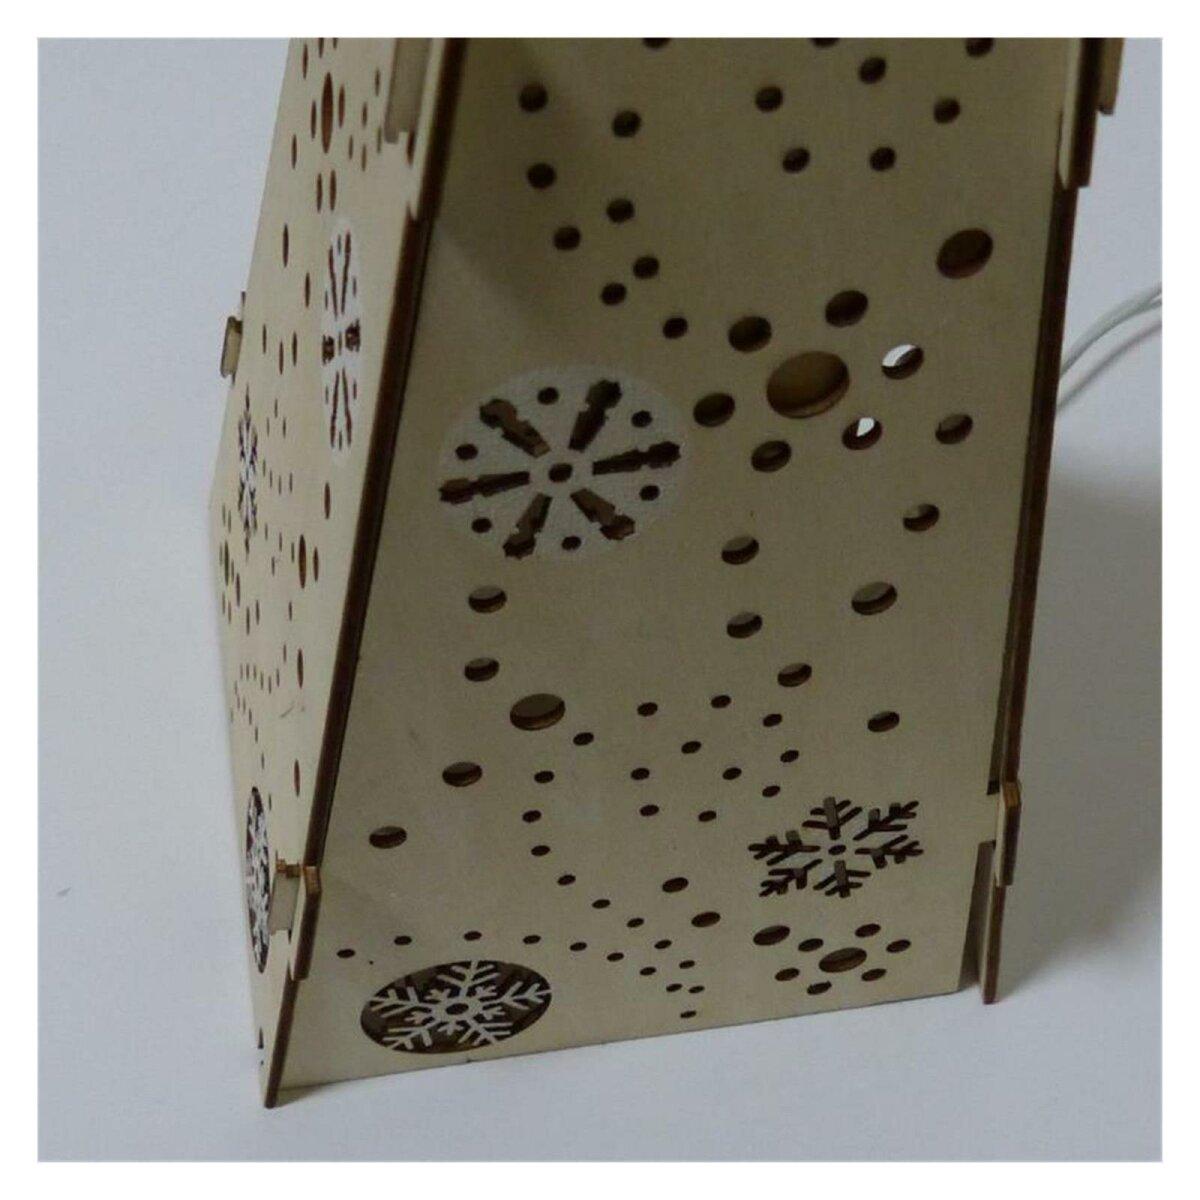 pyramide weihnachtsbeleuchtung holz mit sternen deko lampe 4 90 eur. Black Bedroom Furniture Sets. Home Design Ideas